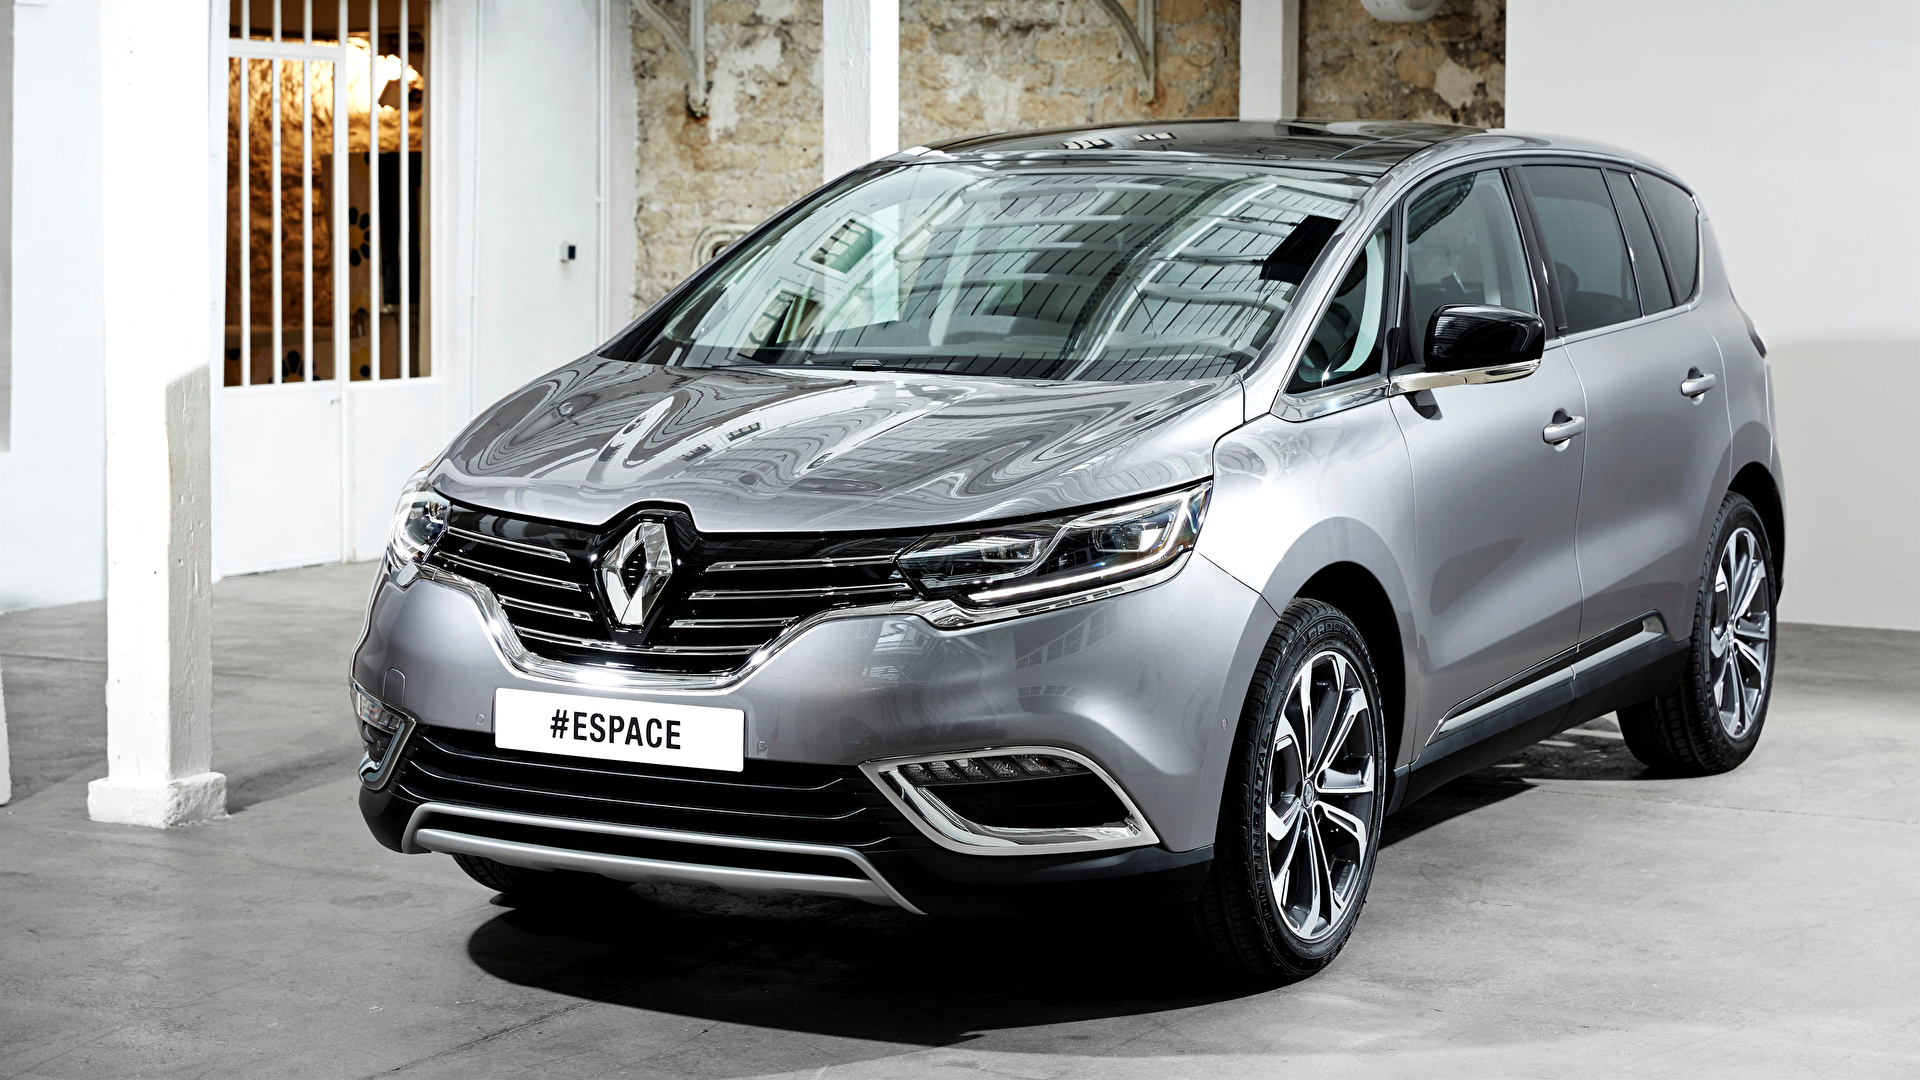 Image Renault 2015 Espace Silver Color Cars 1920x1080